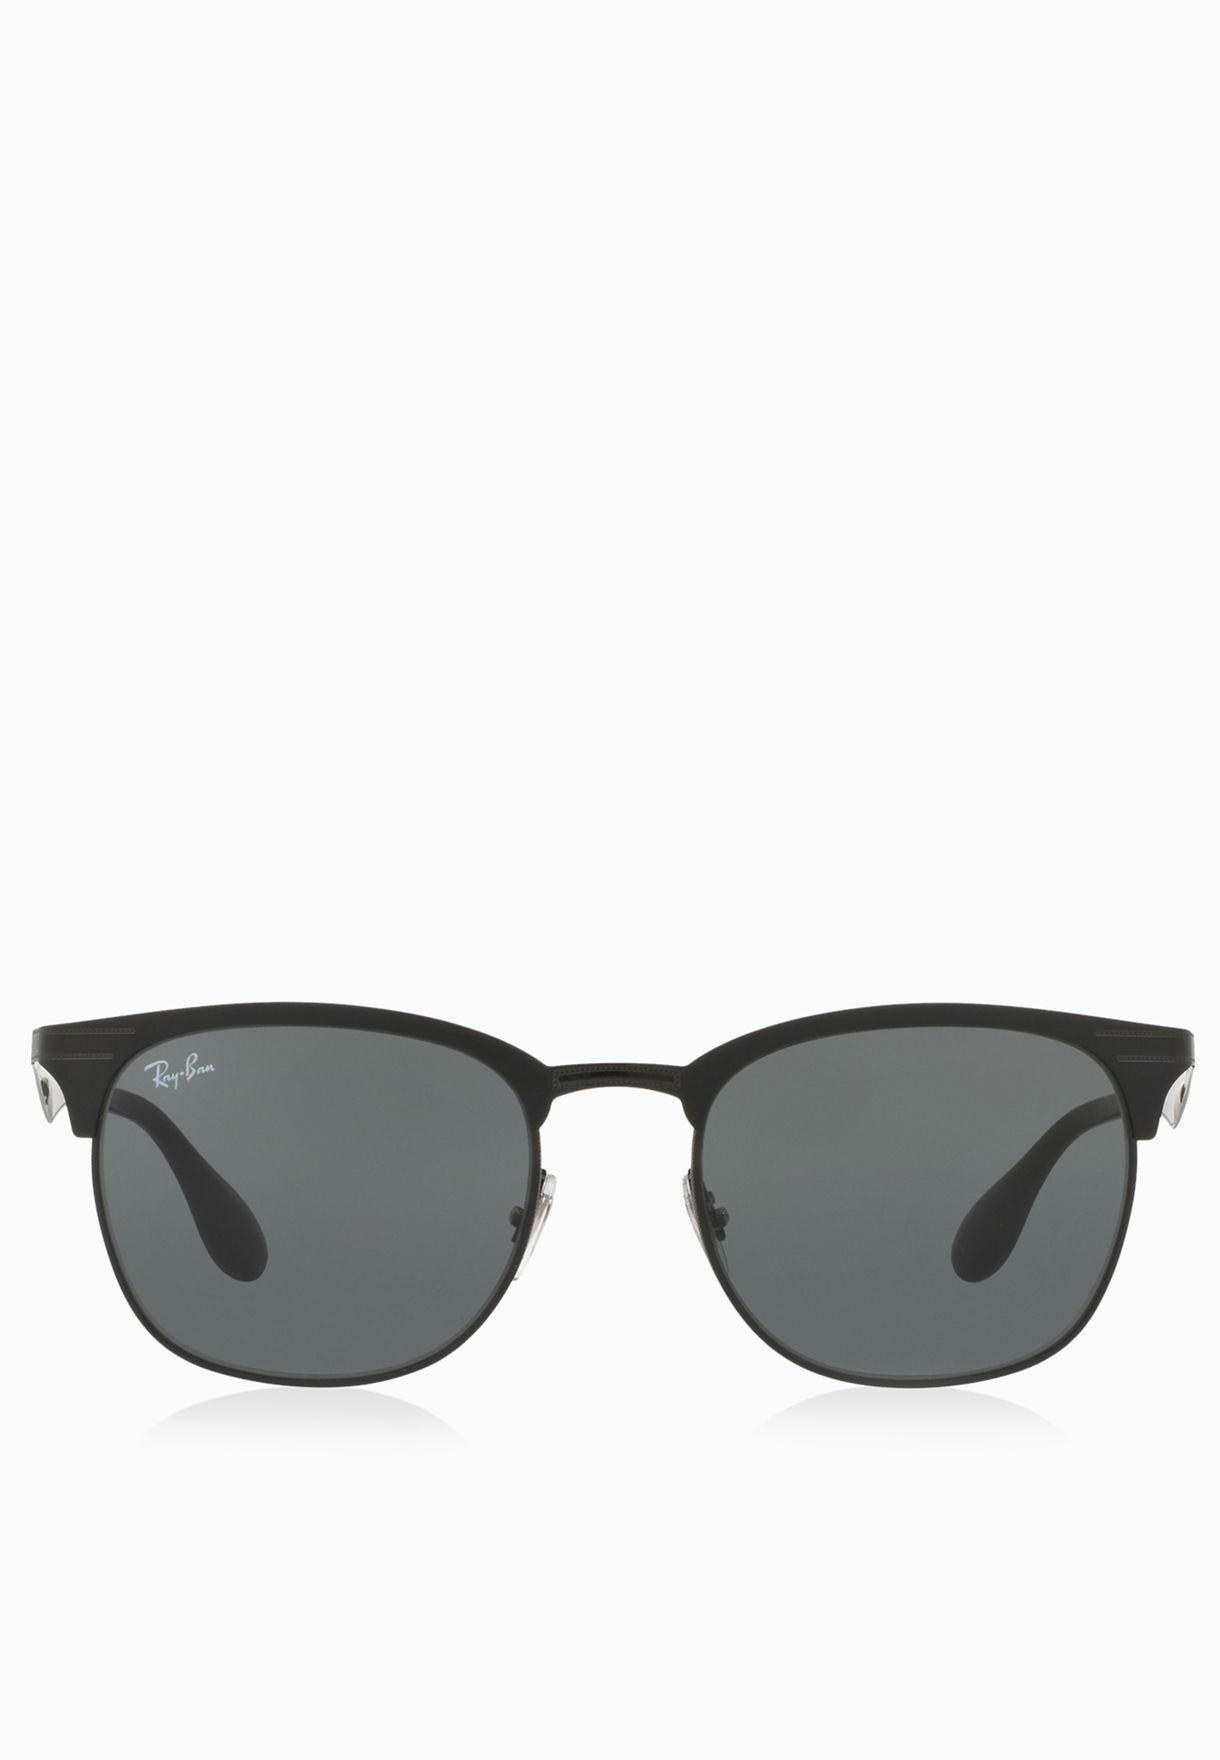 ... discount shop ray ban black square sunglasses 8053672560732 for women  in oman ra736ac57flq 7bf22 850de eda85456ef